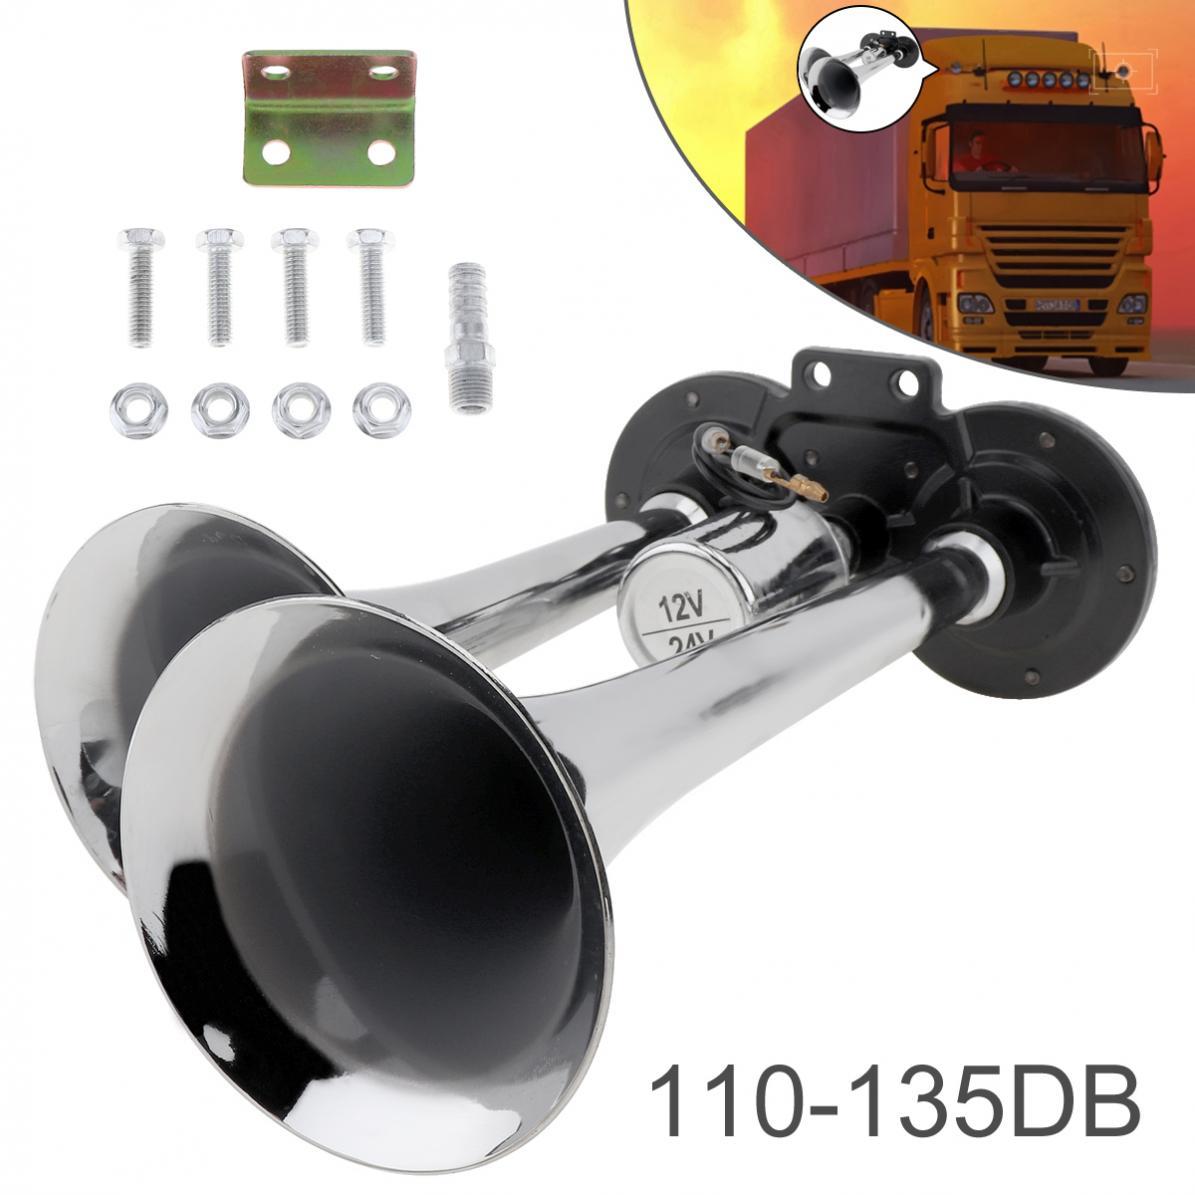 110-135dB Super Loud Heavy Duty Plastic Car Trumpet Auto Train Air Horn for Boat Train Car Vehicle